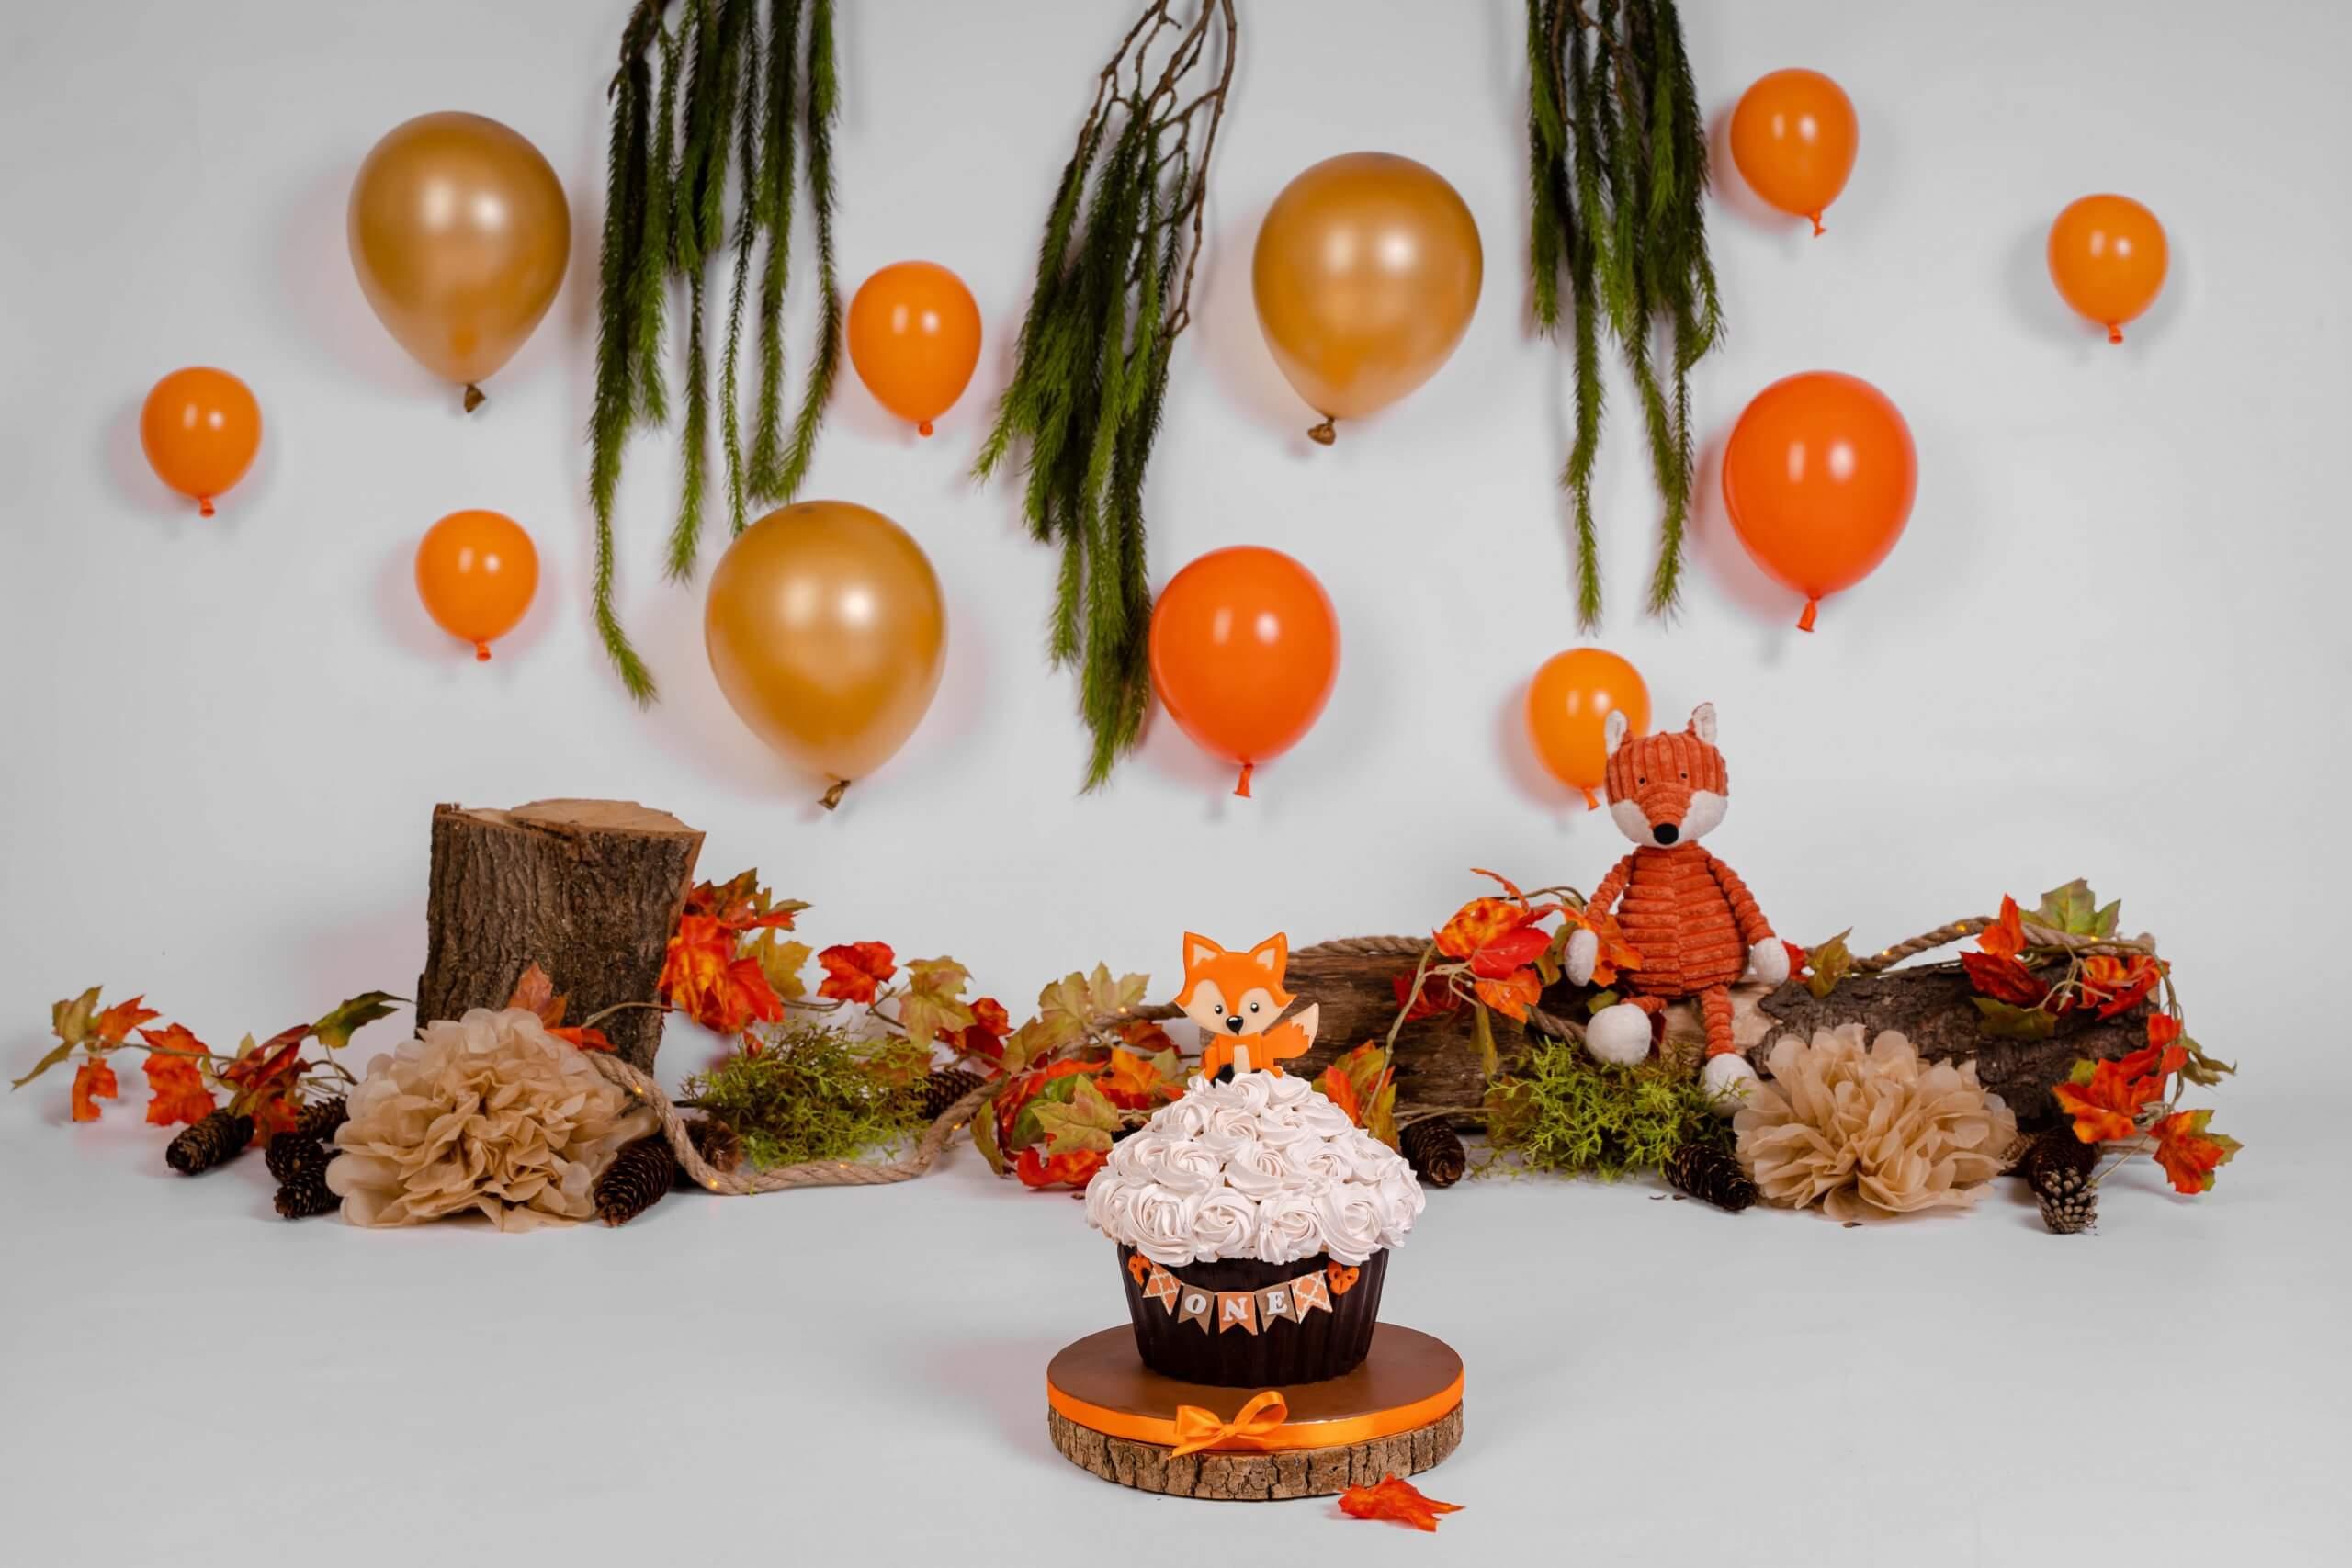 Cake smash vossen thema vos bos forest verjaardag feestje versiering